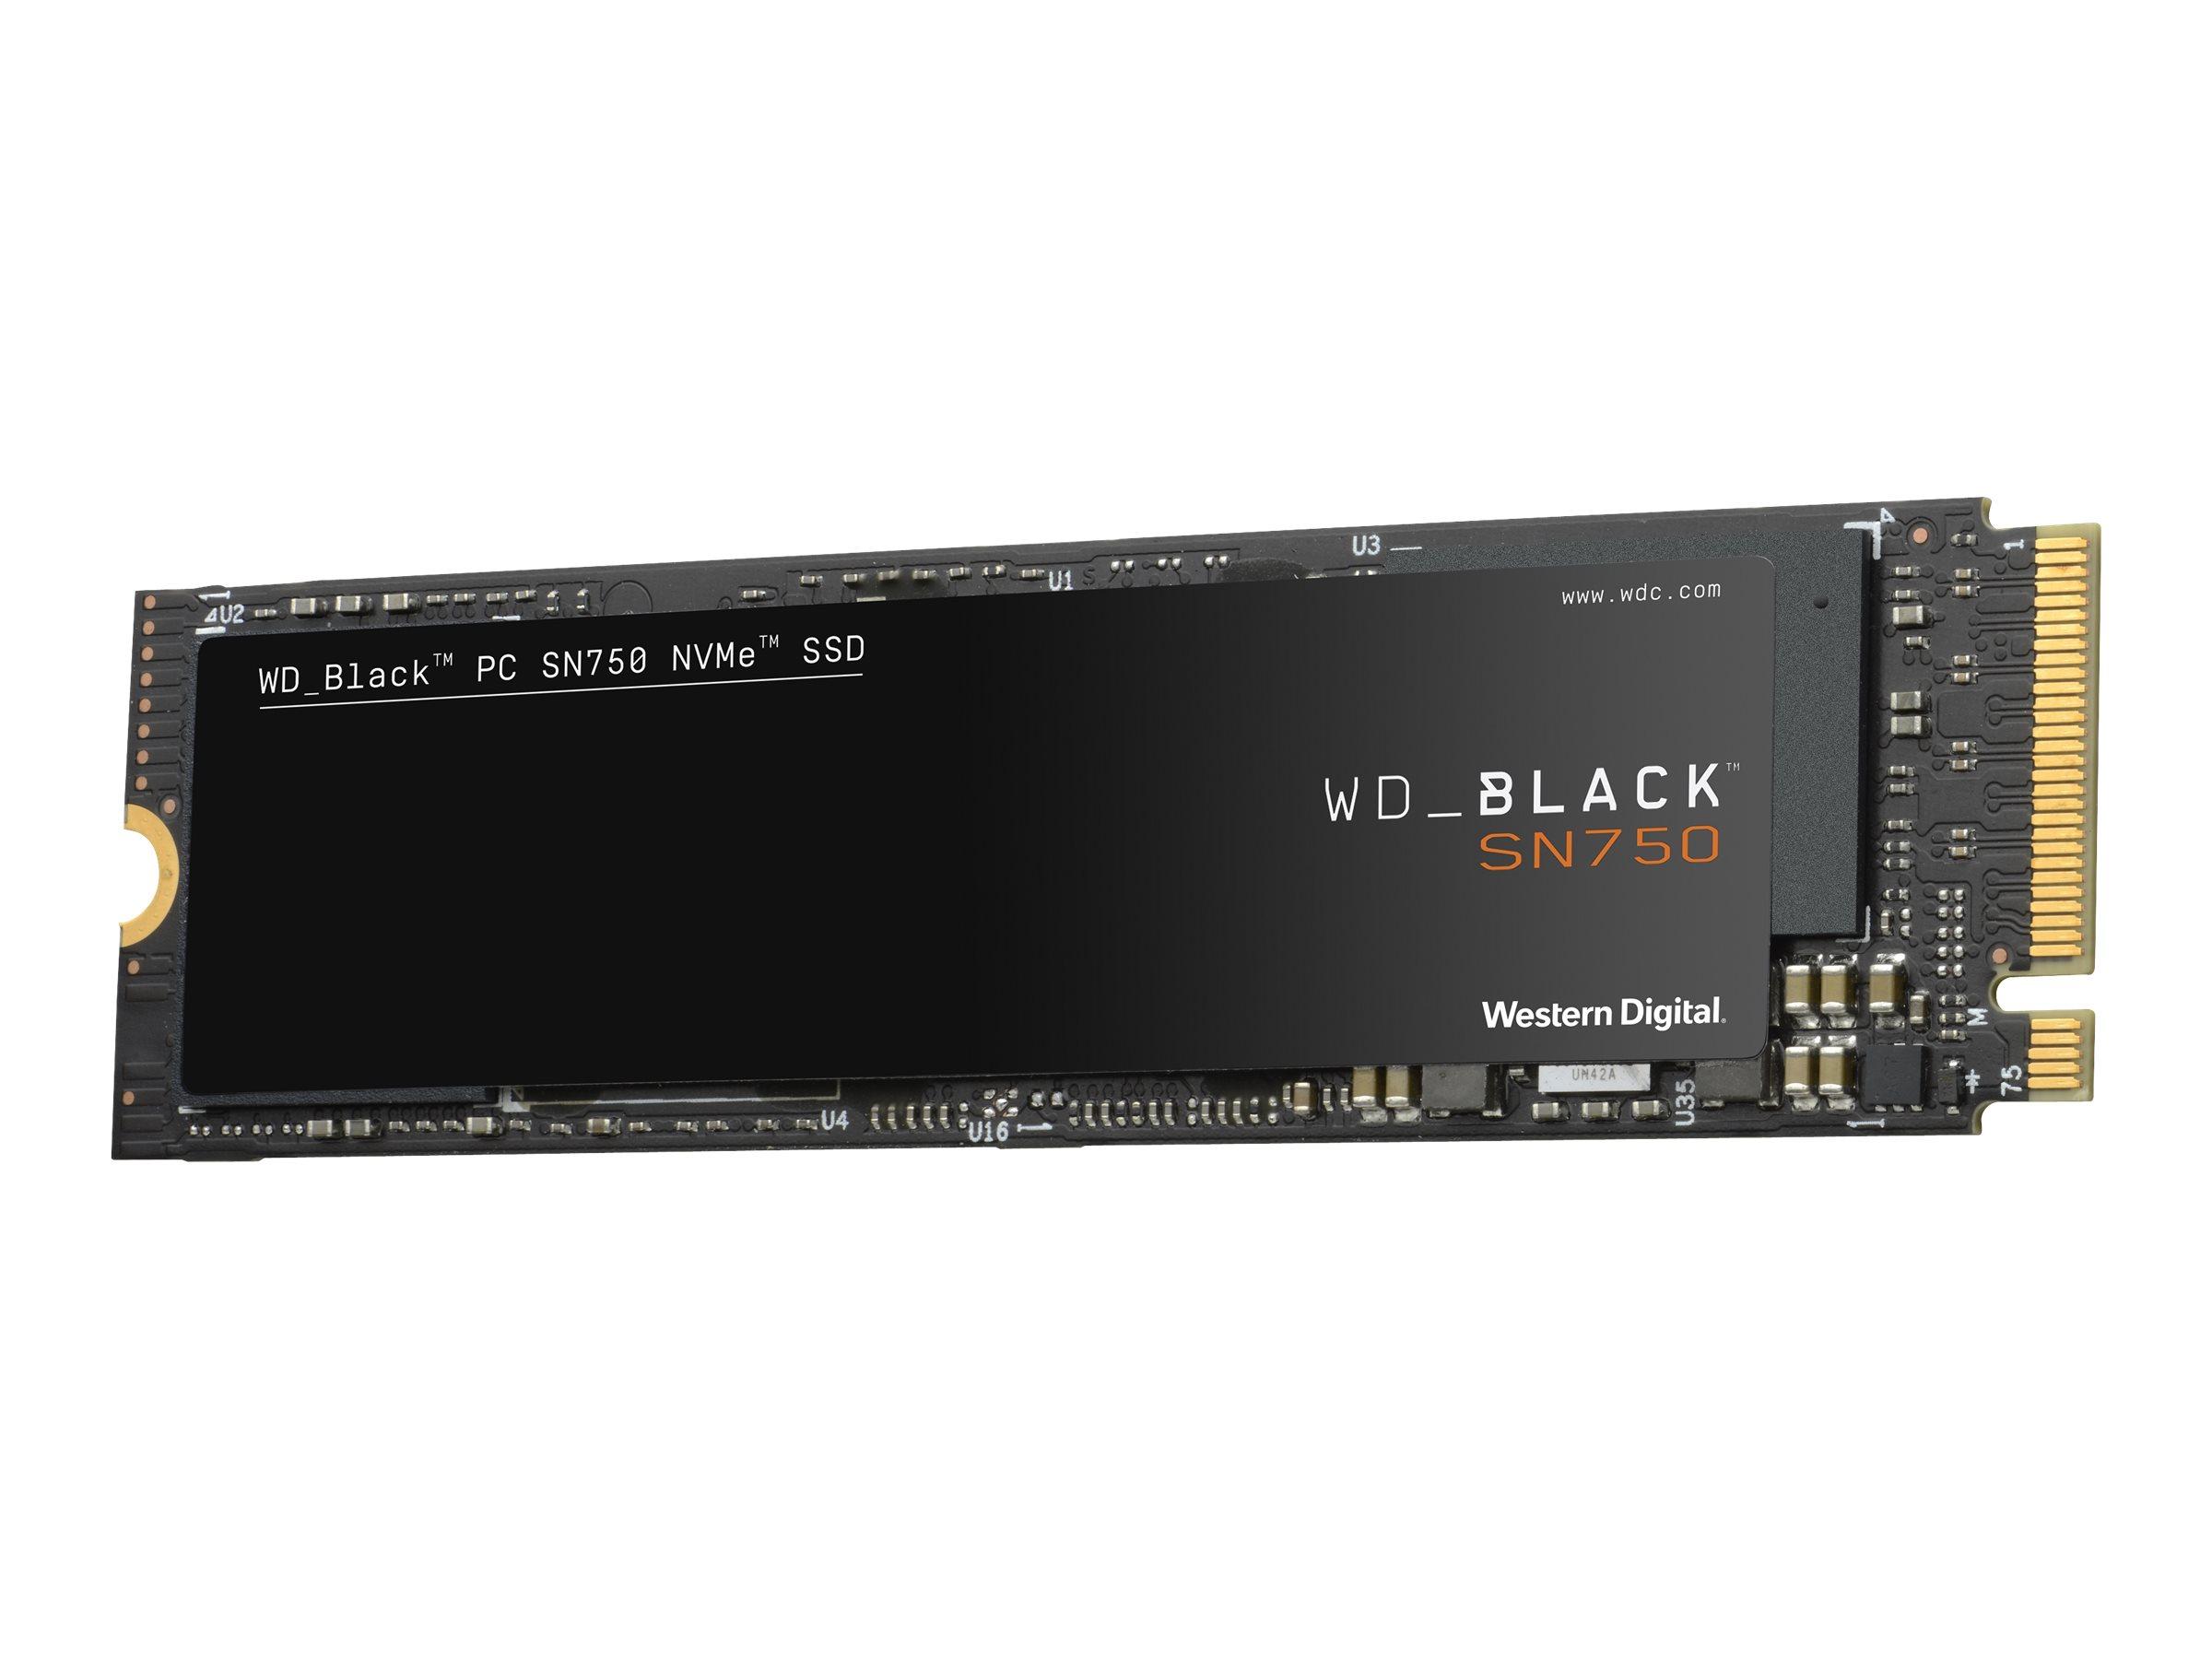 Wd black sn750 nvme ssd wds250g3x0c solid state disk 250 gb intern m 2 2280 pci express 3 0 x4 nvme 10892289 wds250g3x0c